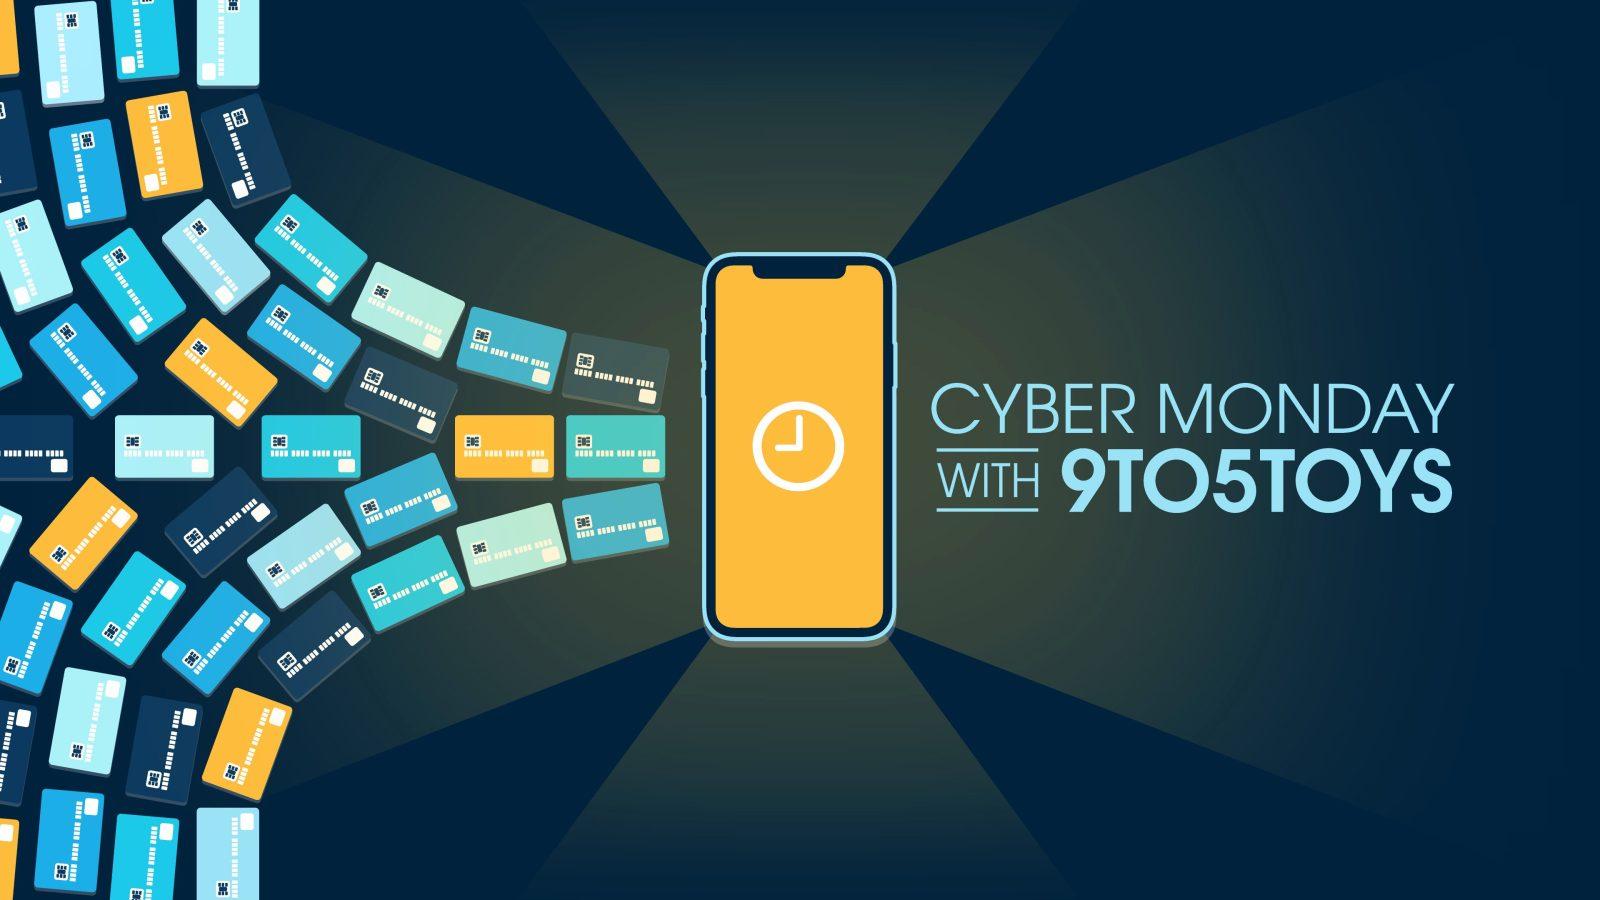 Best Cyber Monday Deals Apple Watch Macbooks Ipad More 9to5mac